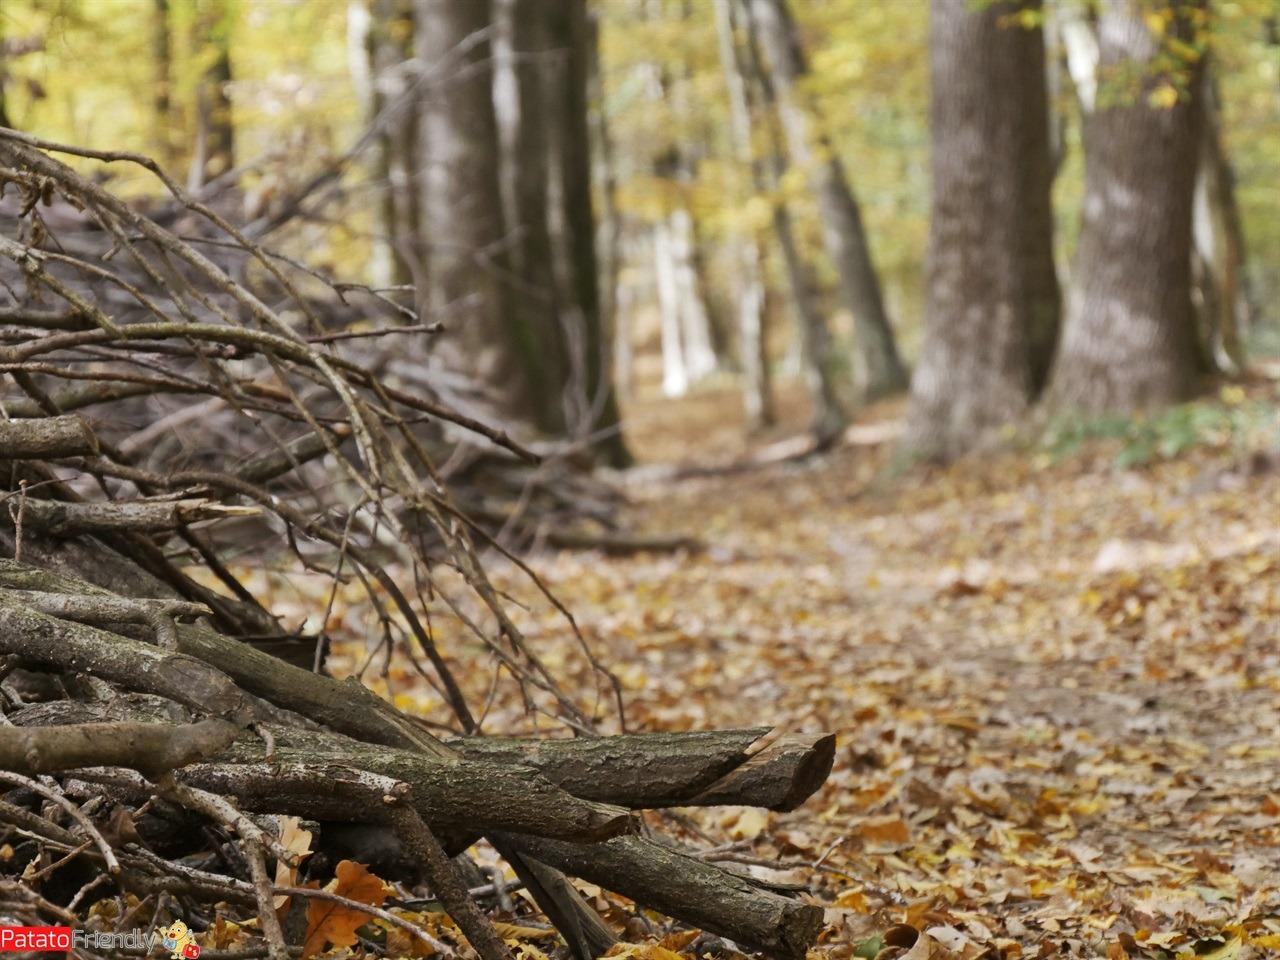 [cml_media_alt id='12714']Foliage Montevecchia - Ca Soldato[/cml_media_alt]